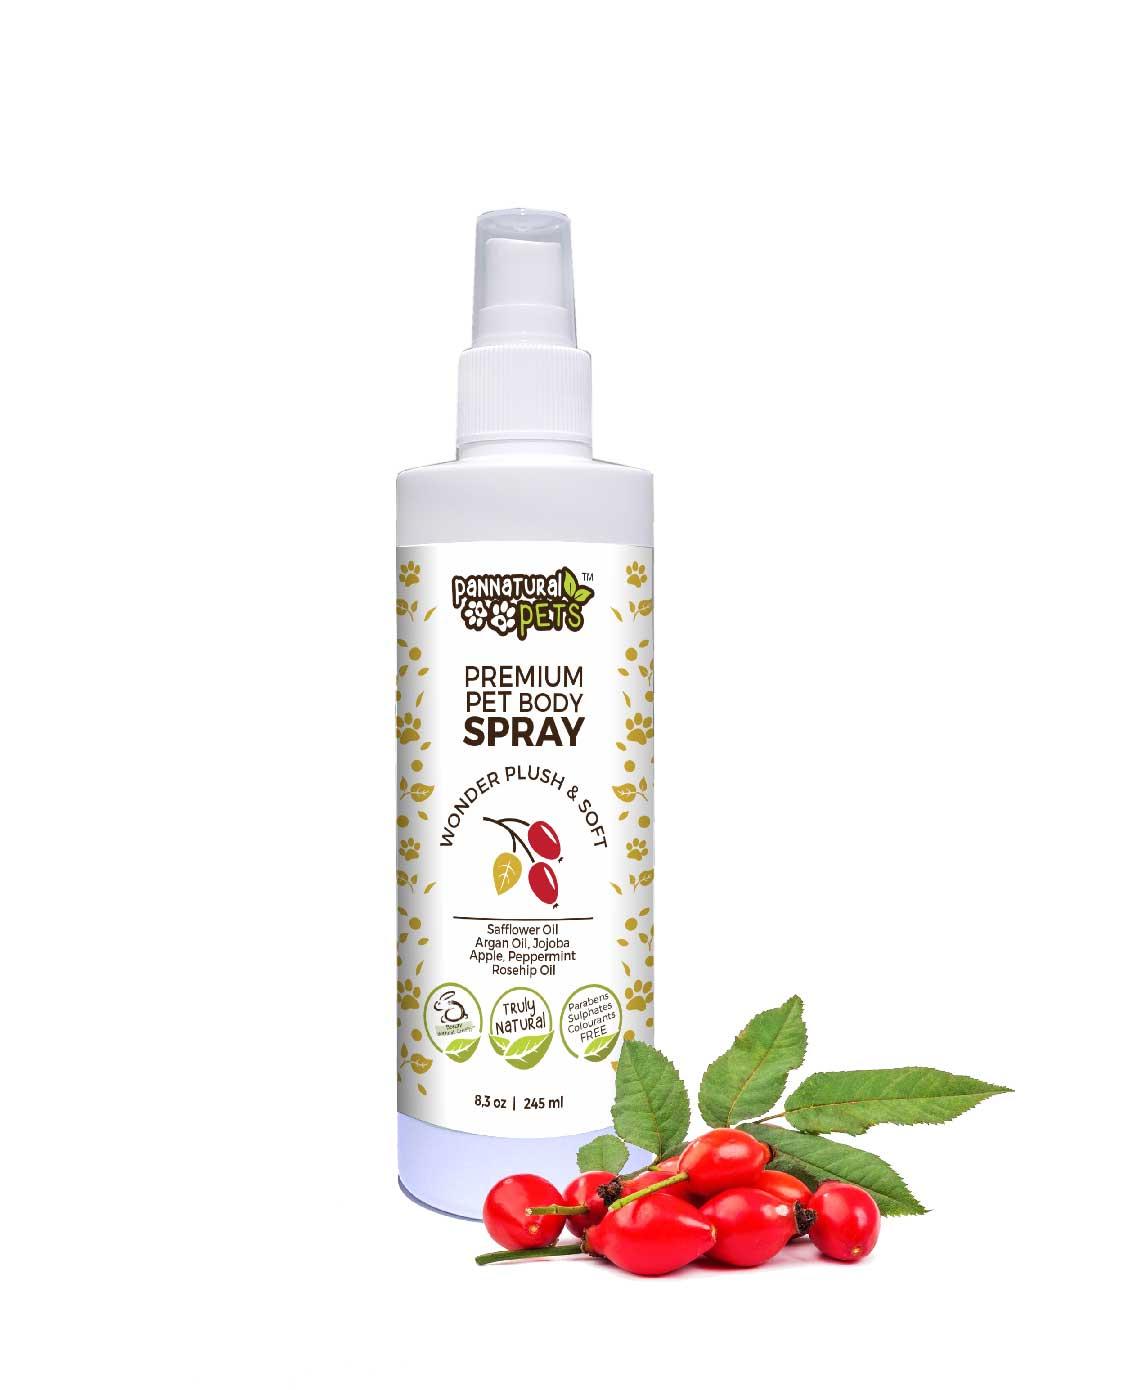 Premium Natural Pet Body Spray Wonder Plush & Soft